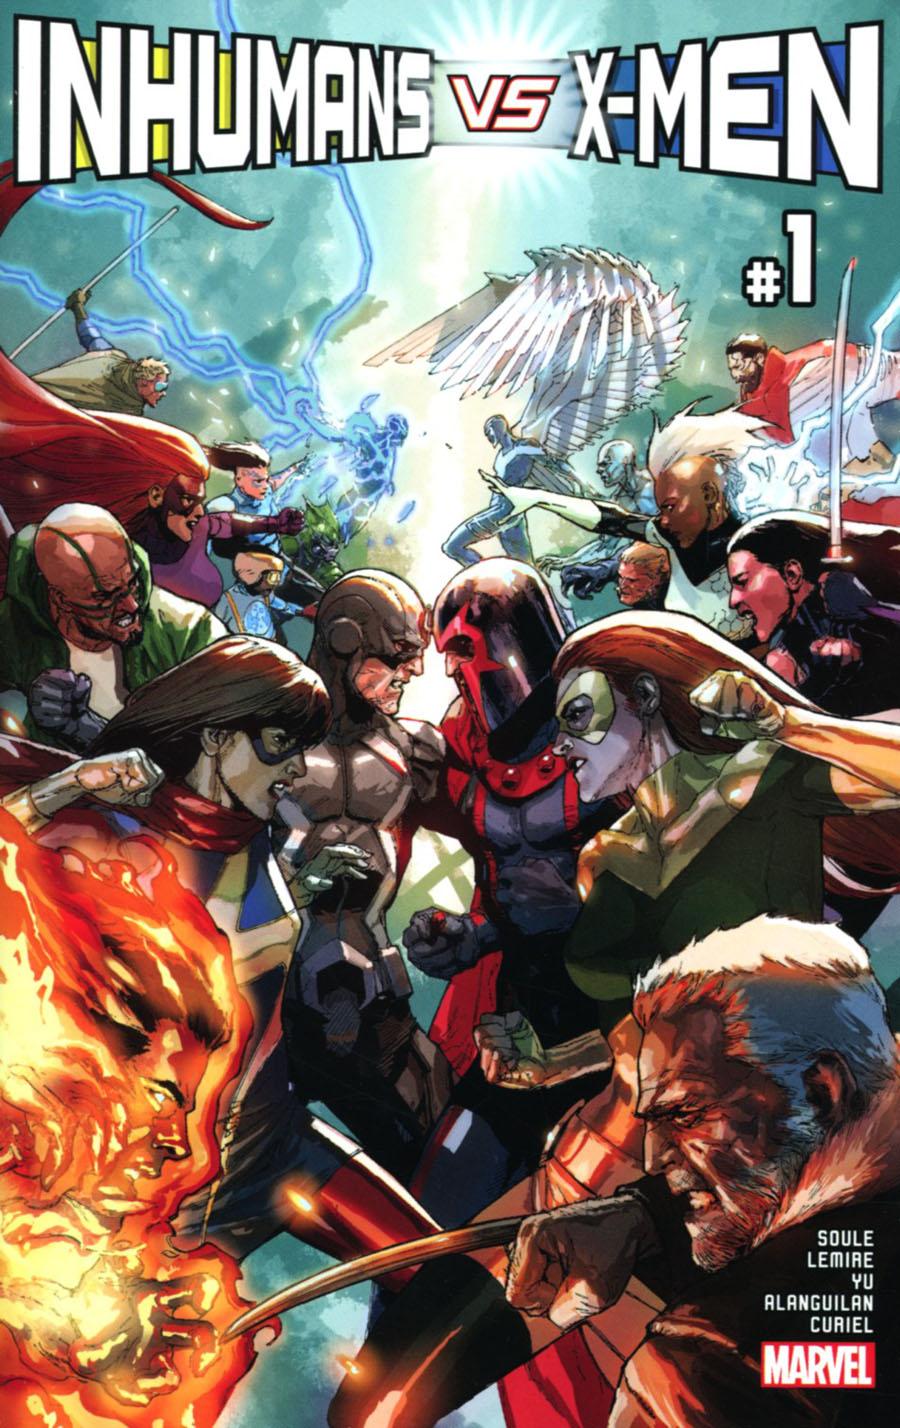 Inhumans vs X-Men #1 Cover A Regular Leinil Francis Yu Cover